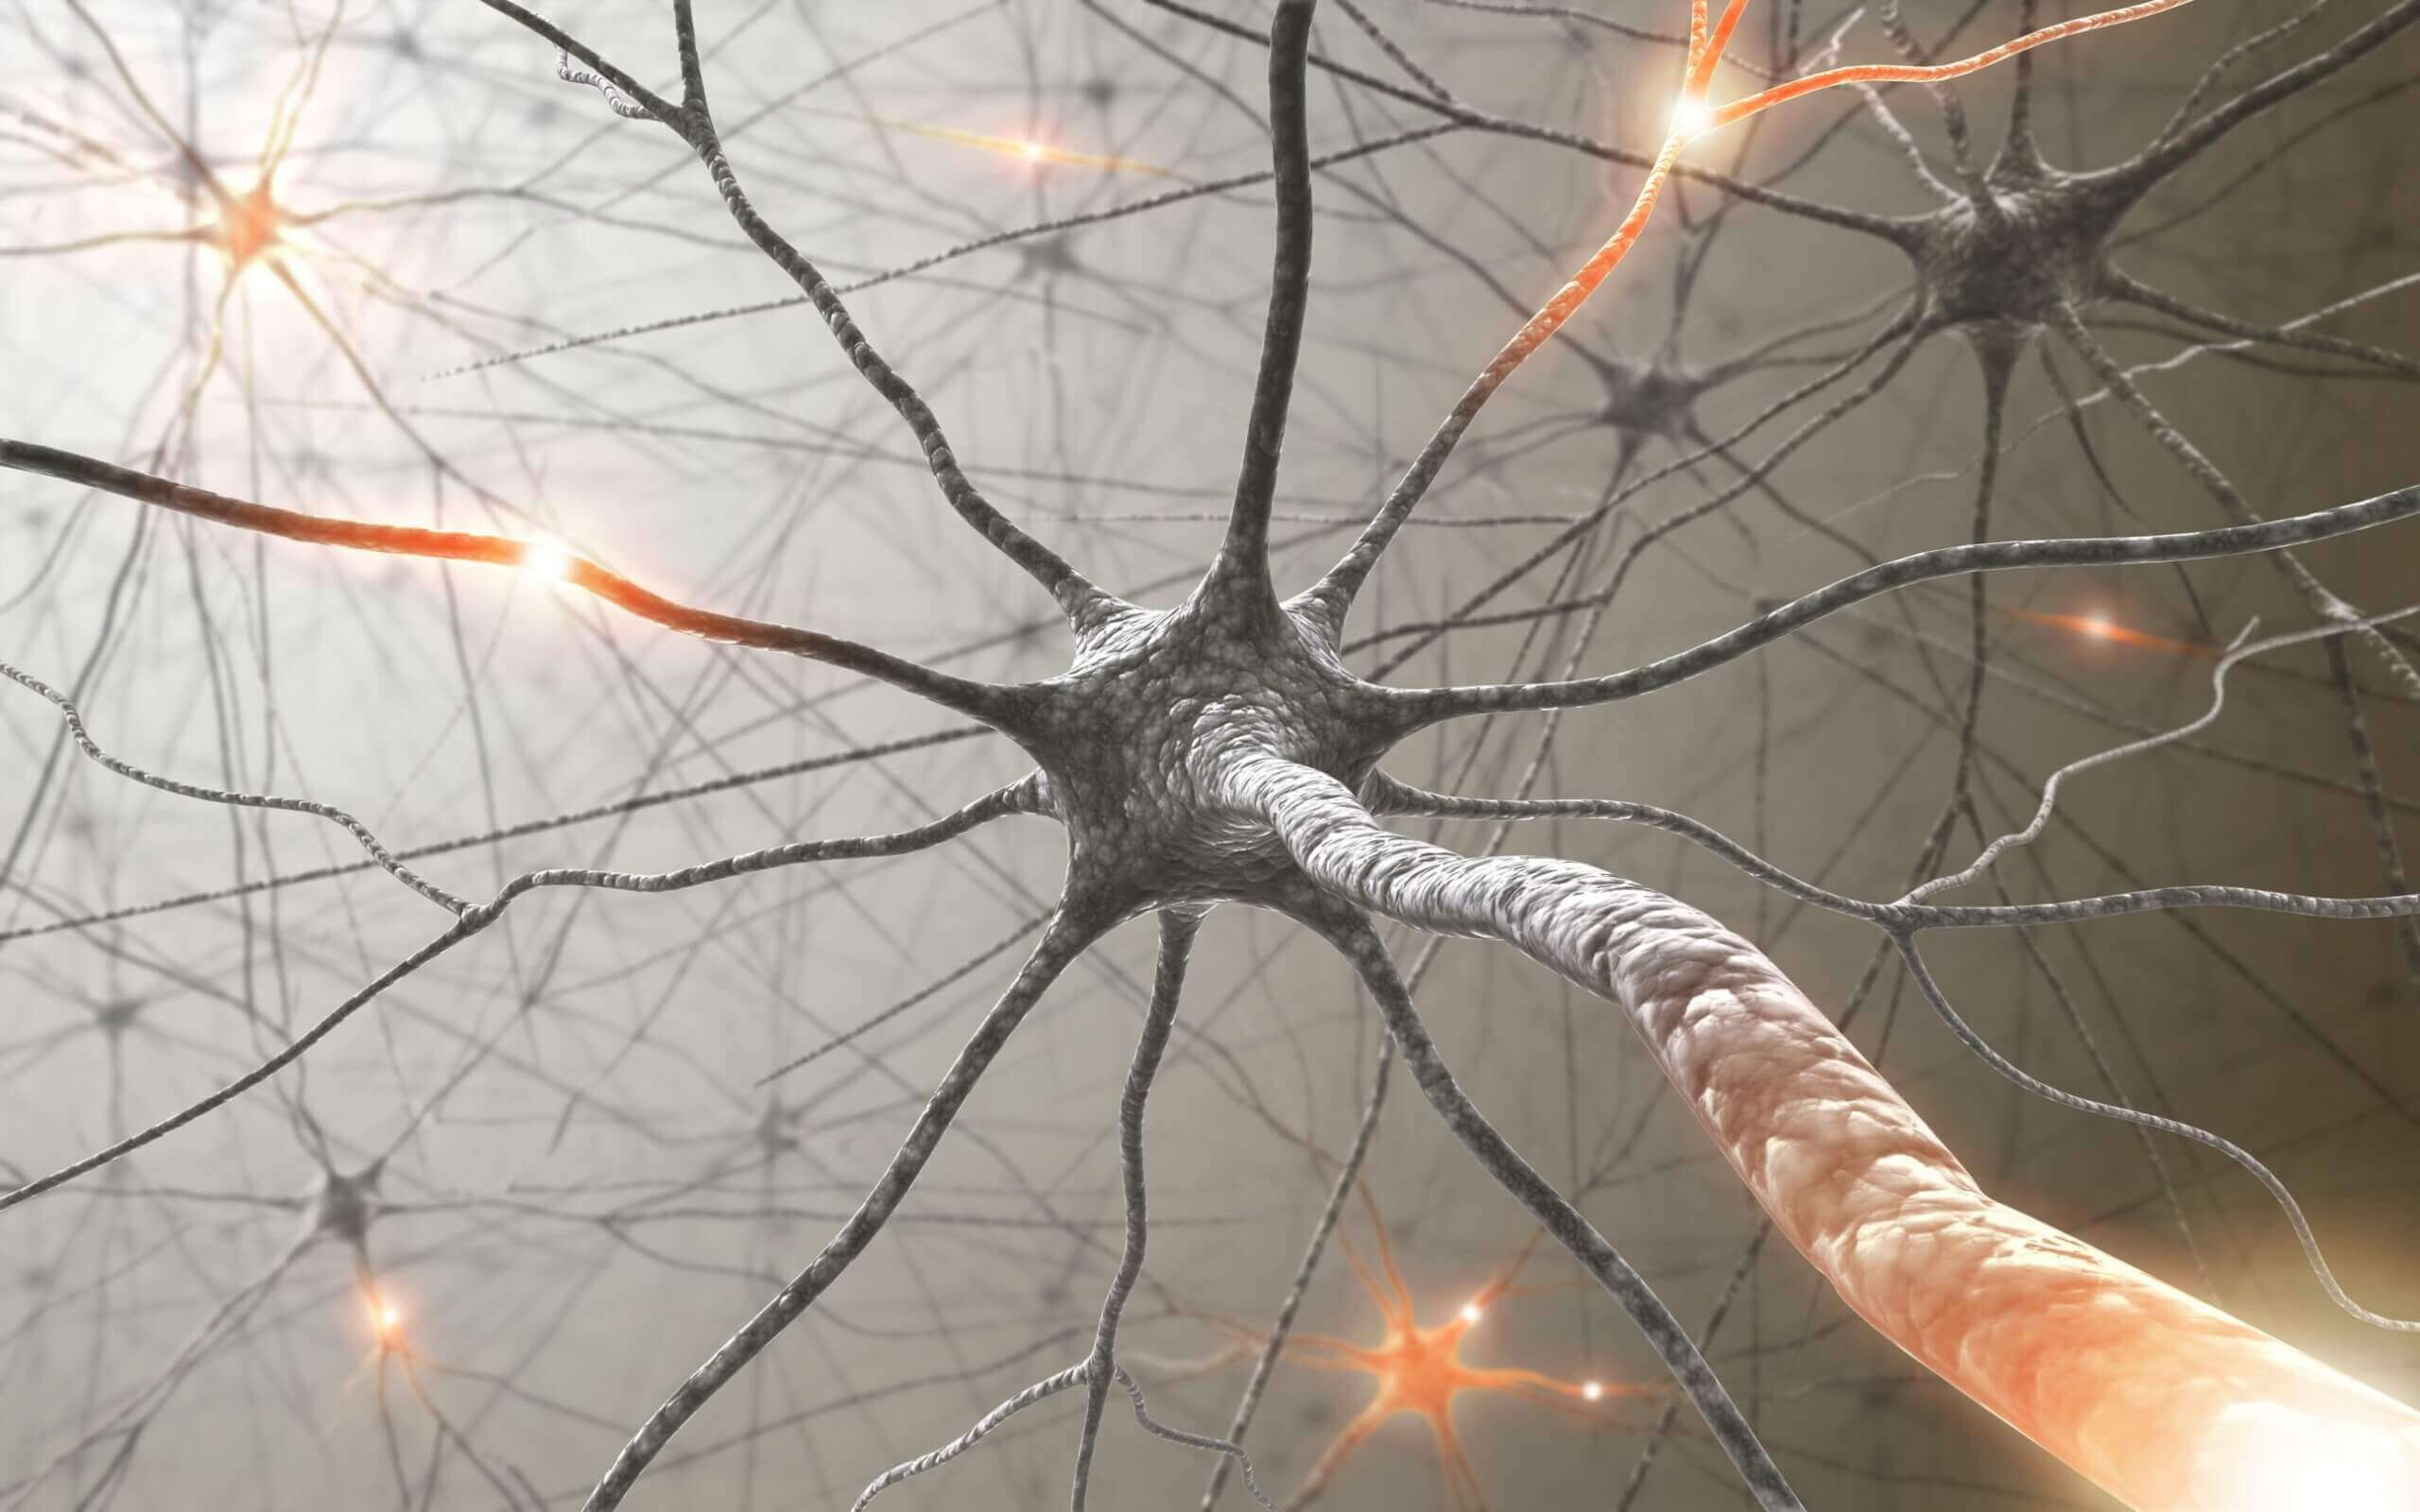 bağlı nörünlar